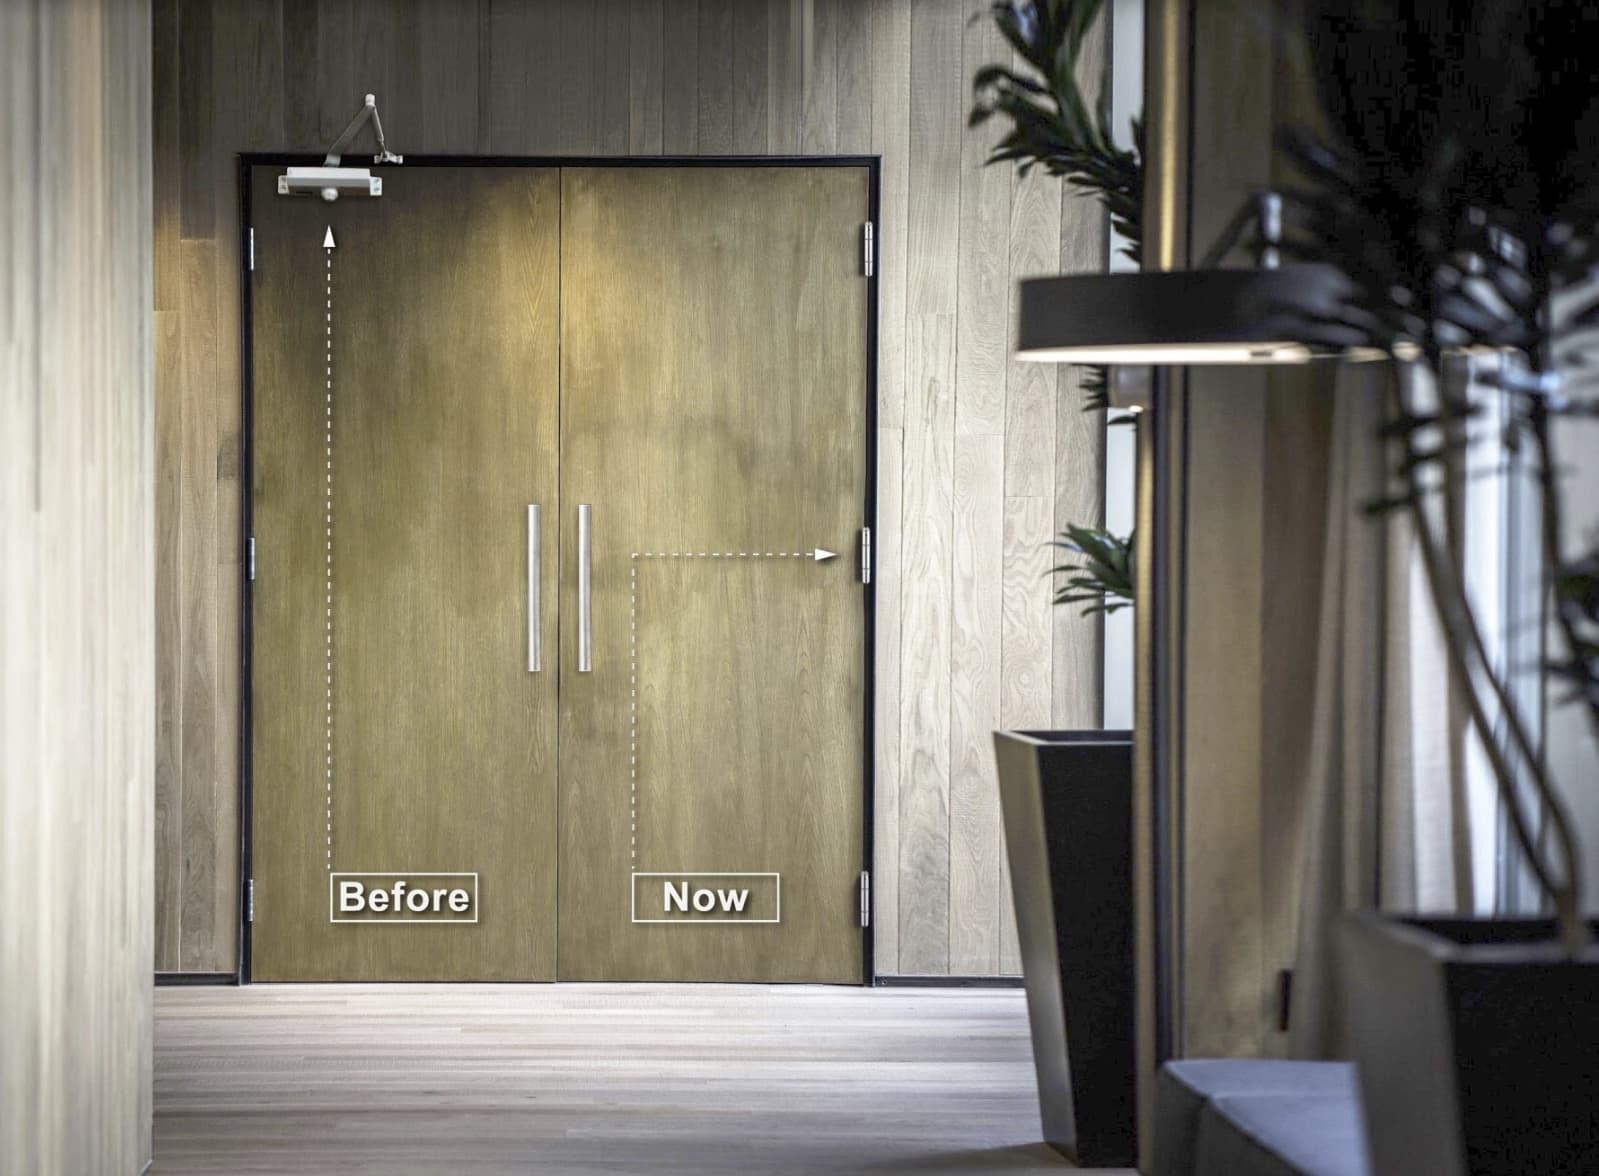 Arched Door Closer vs Closer Hinge Waterson